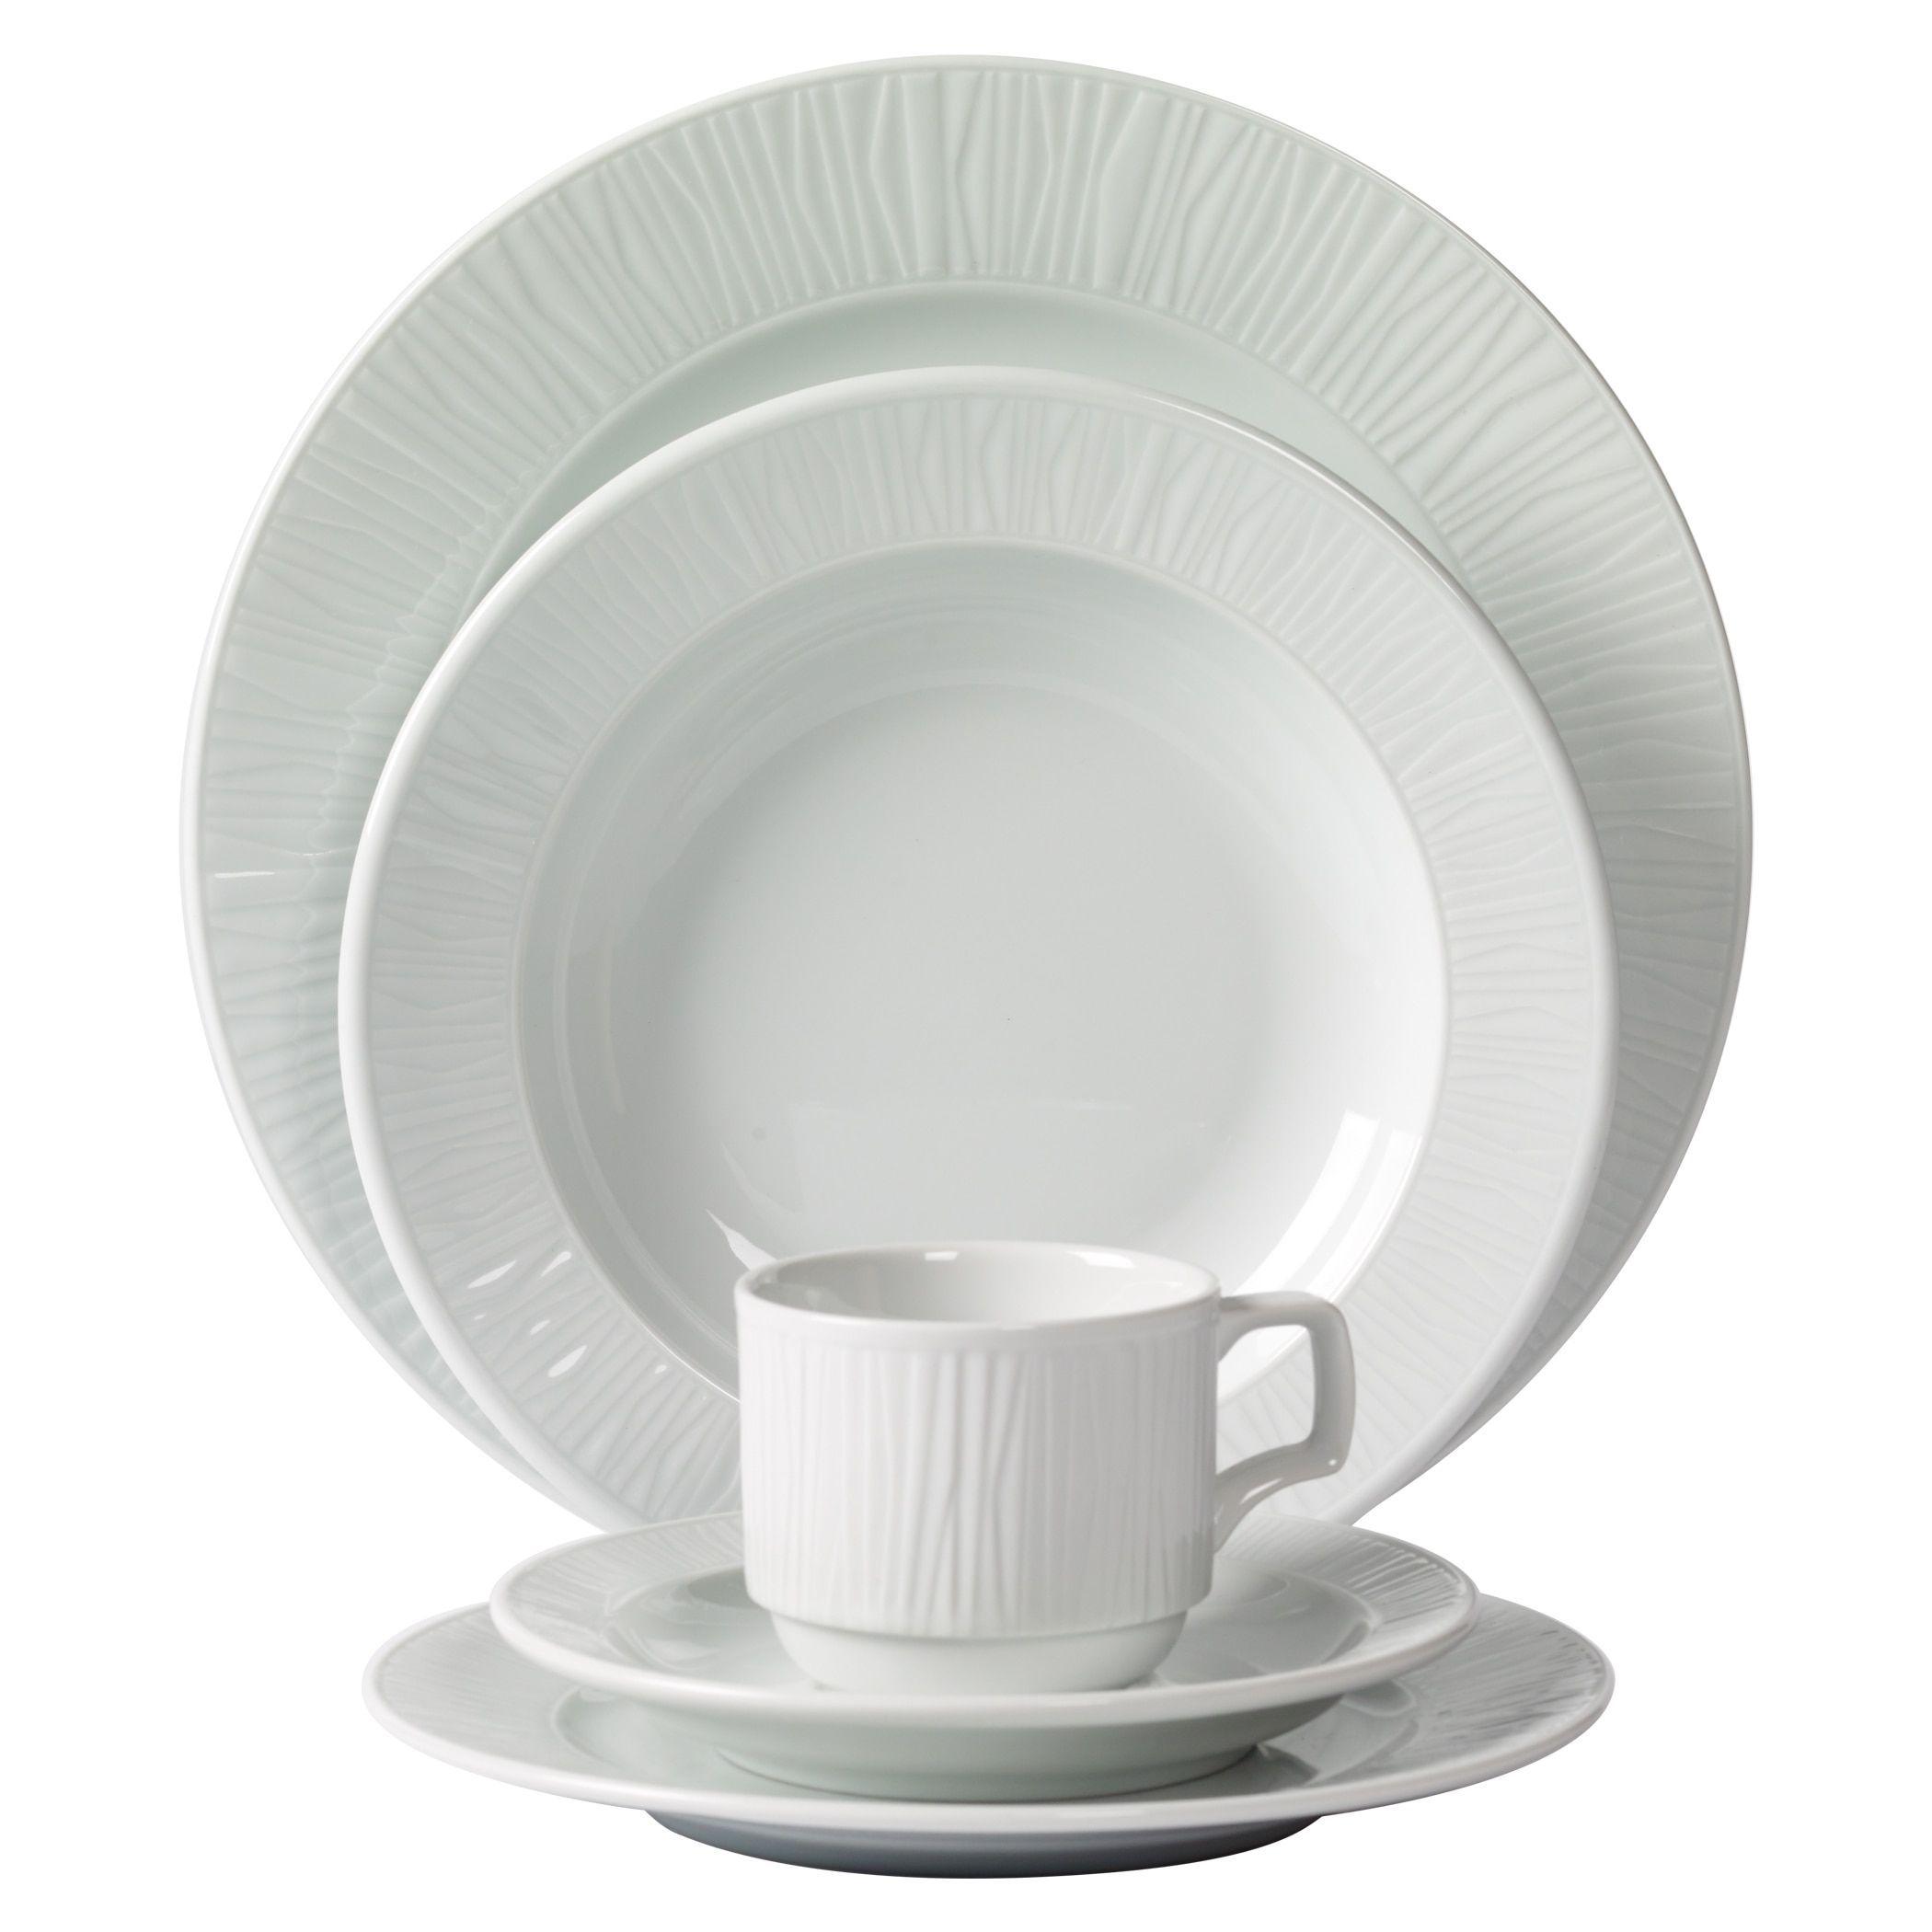 Overstock.com Online Shopping - Bedding Furniture Electronics Jewelry Clothing \u0026 more. Casual DinnerwareDinnerware SetsPorcelain ...  sc 1 st  Pinterest & Tabletops Unlimited Mitterteich Emotion Embossed Porcelain 20-piece ...